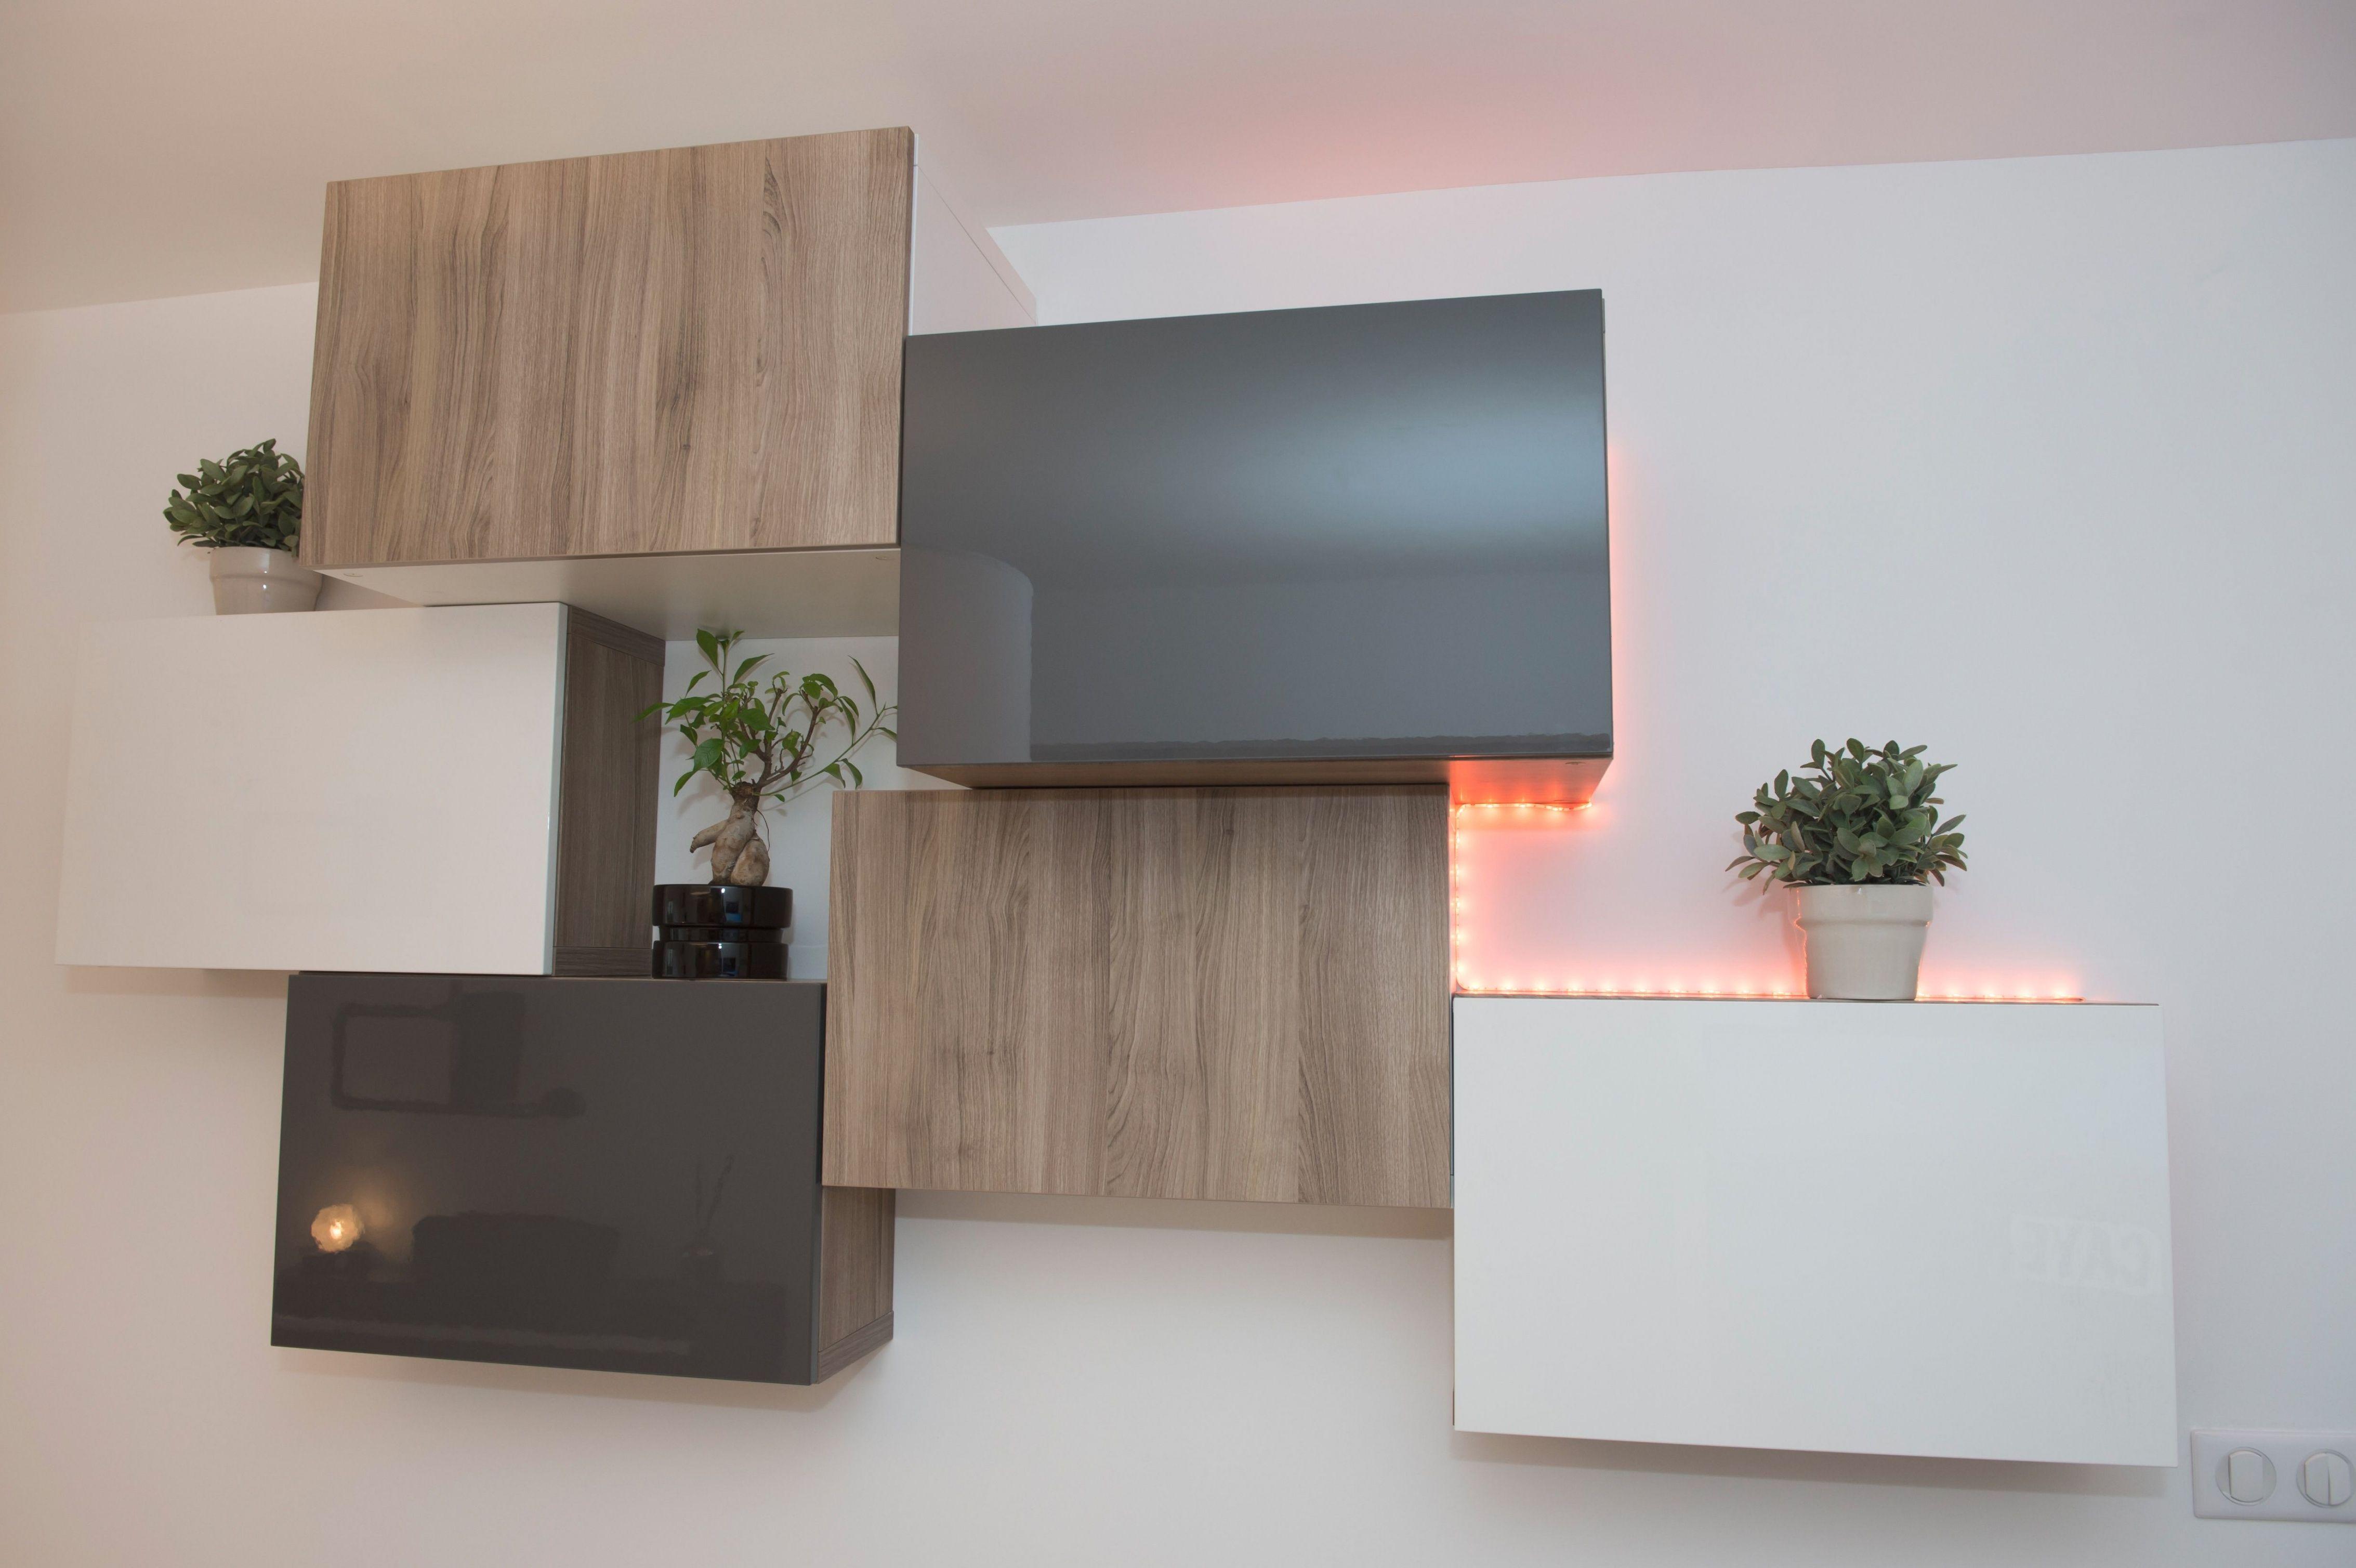 Pin By Prtha Lastnight On Kitchen Design In 2019 Ikea